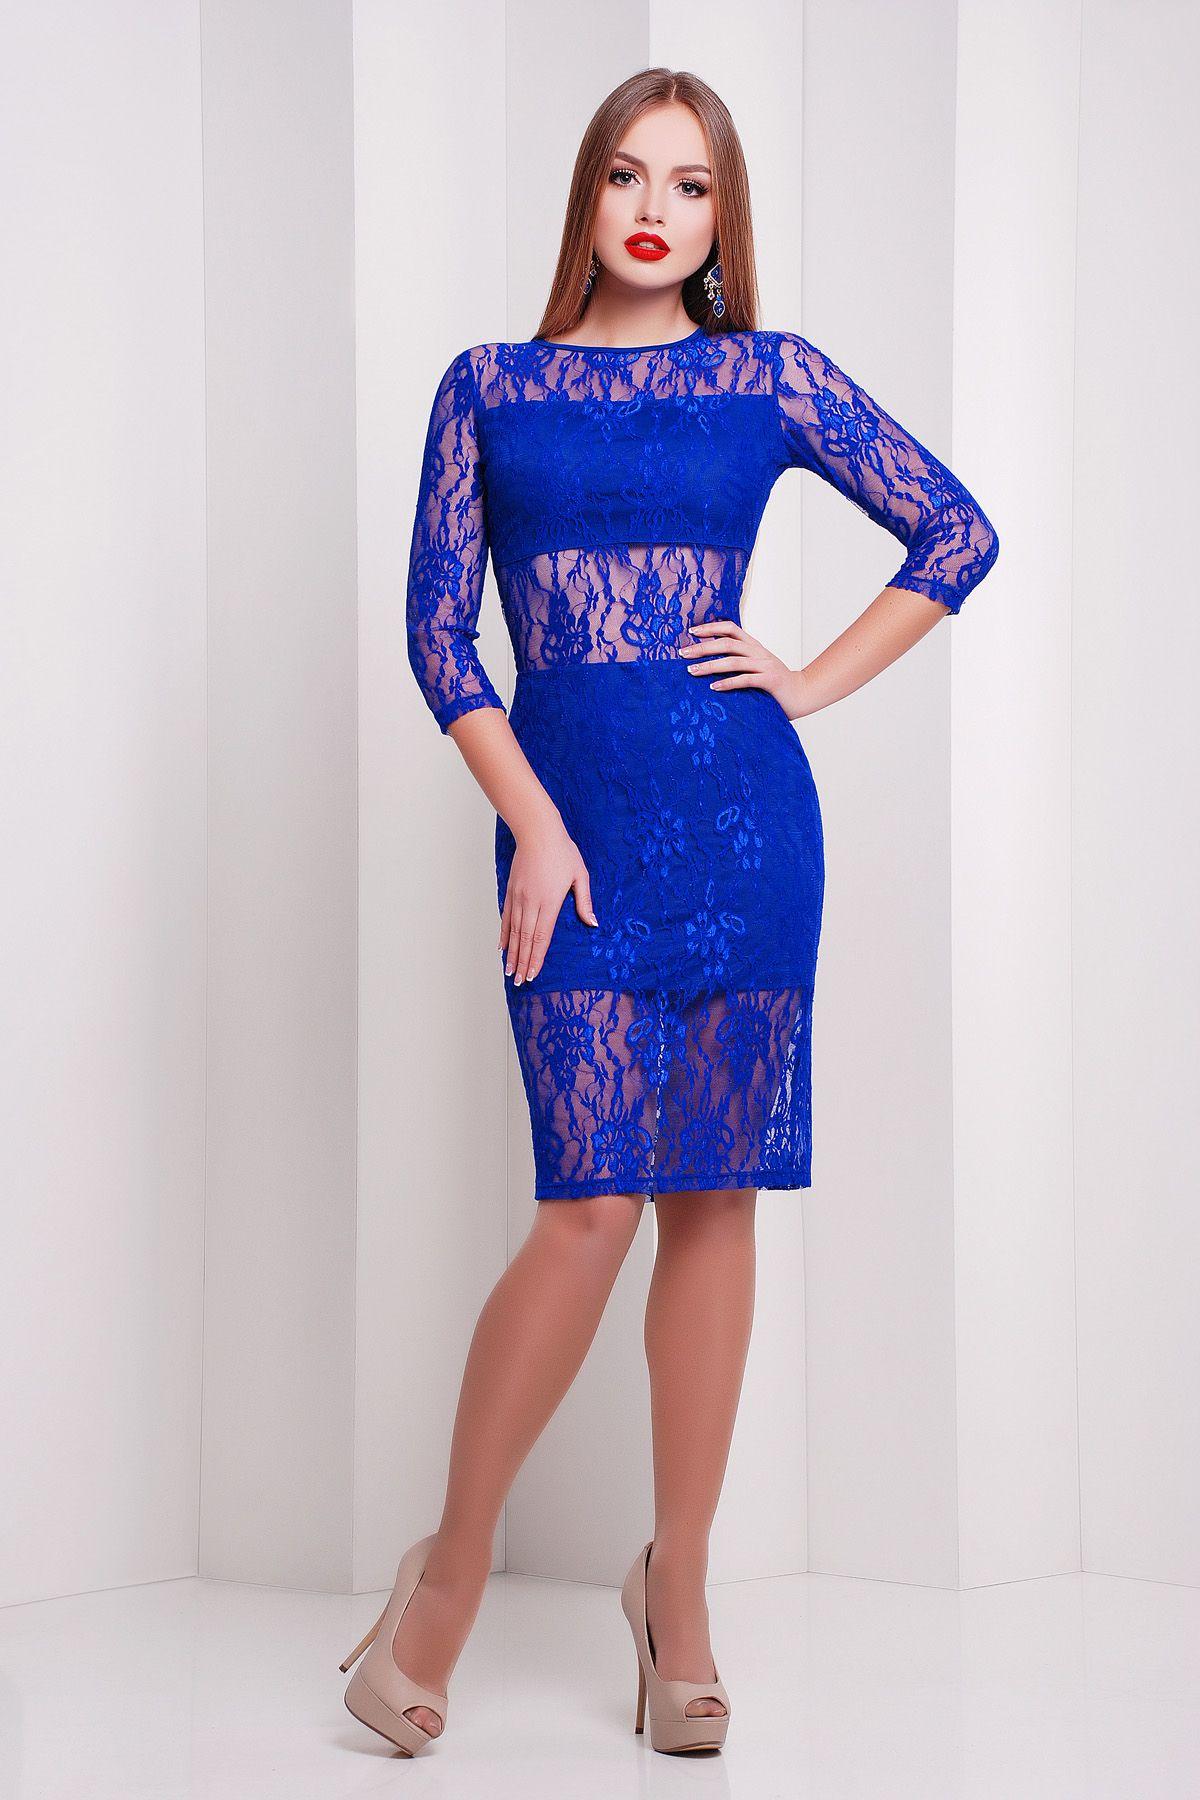 89c8a657c379076 Нарядное платье из гипюра синего цвета на сезон весна-лето Пасадена д/р.